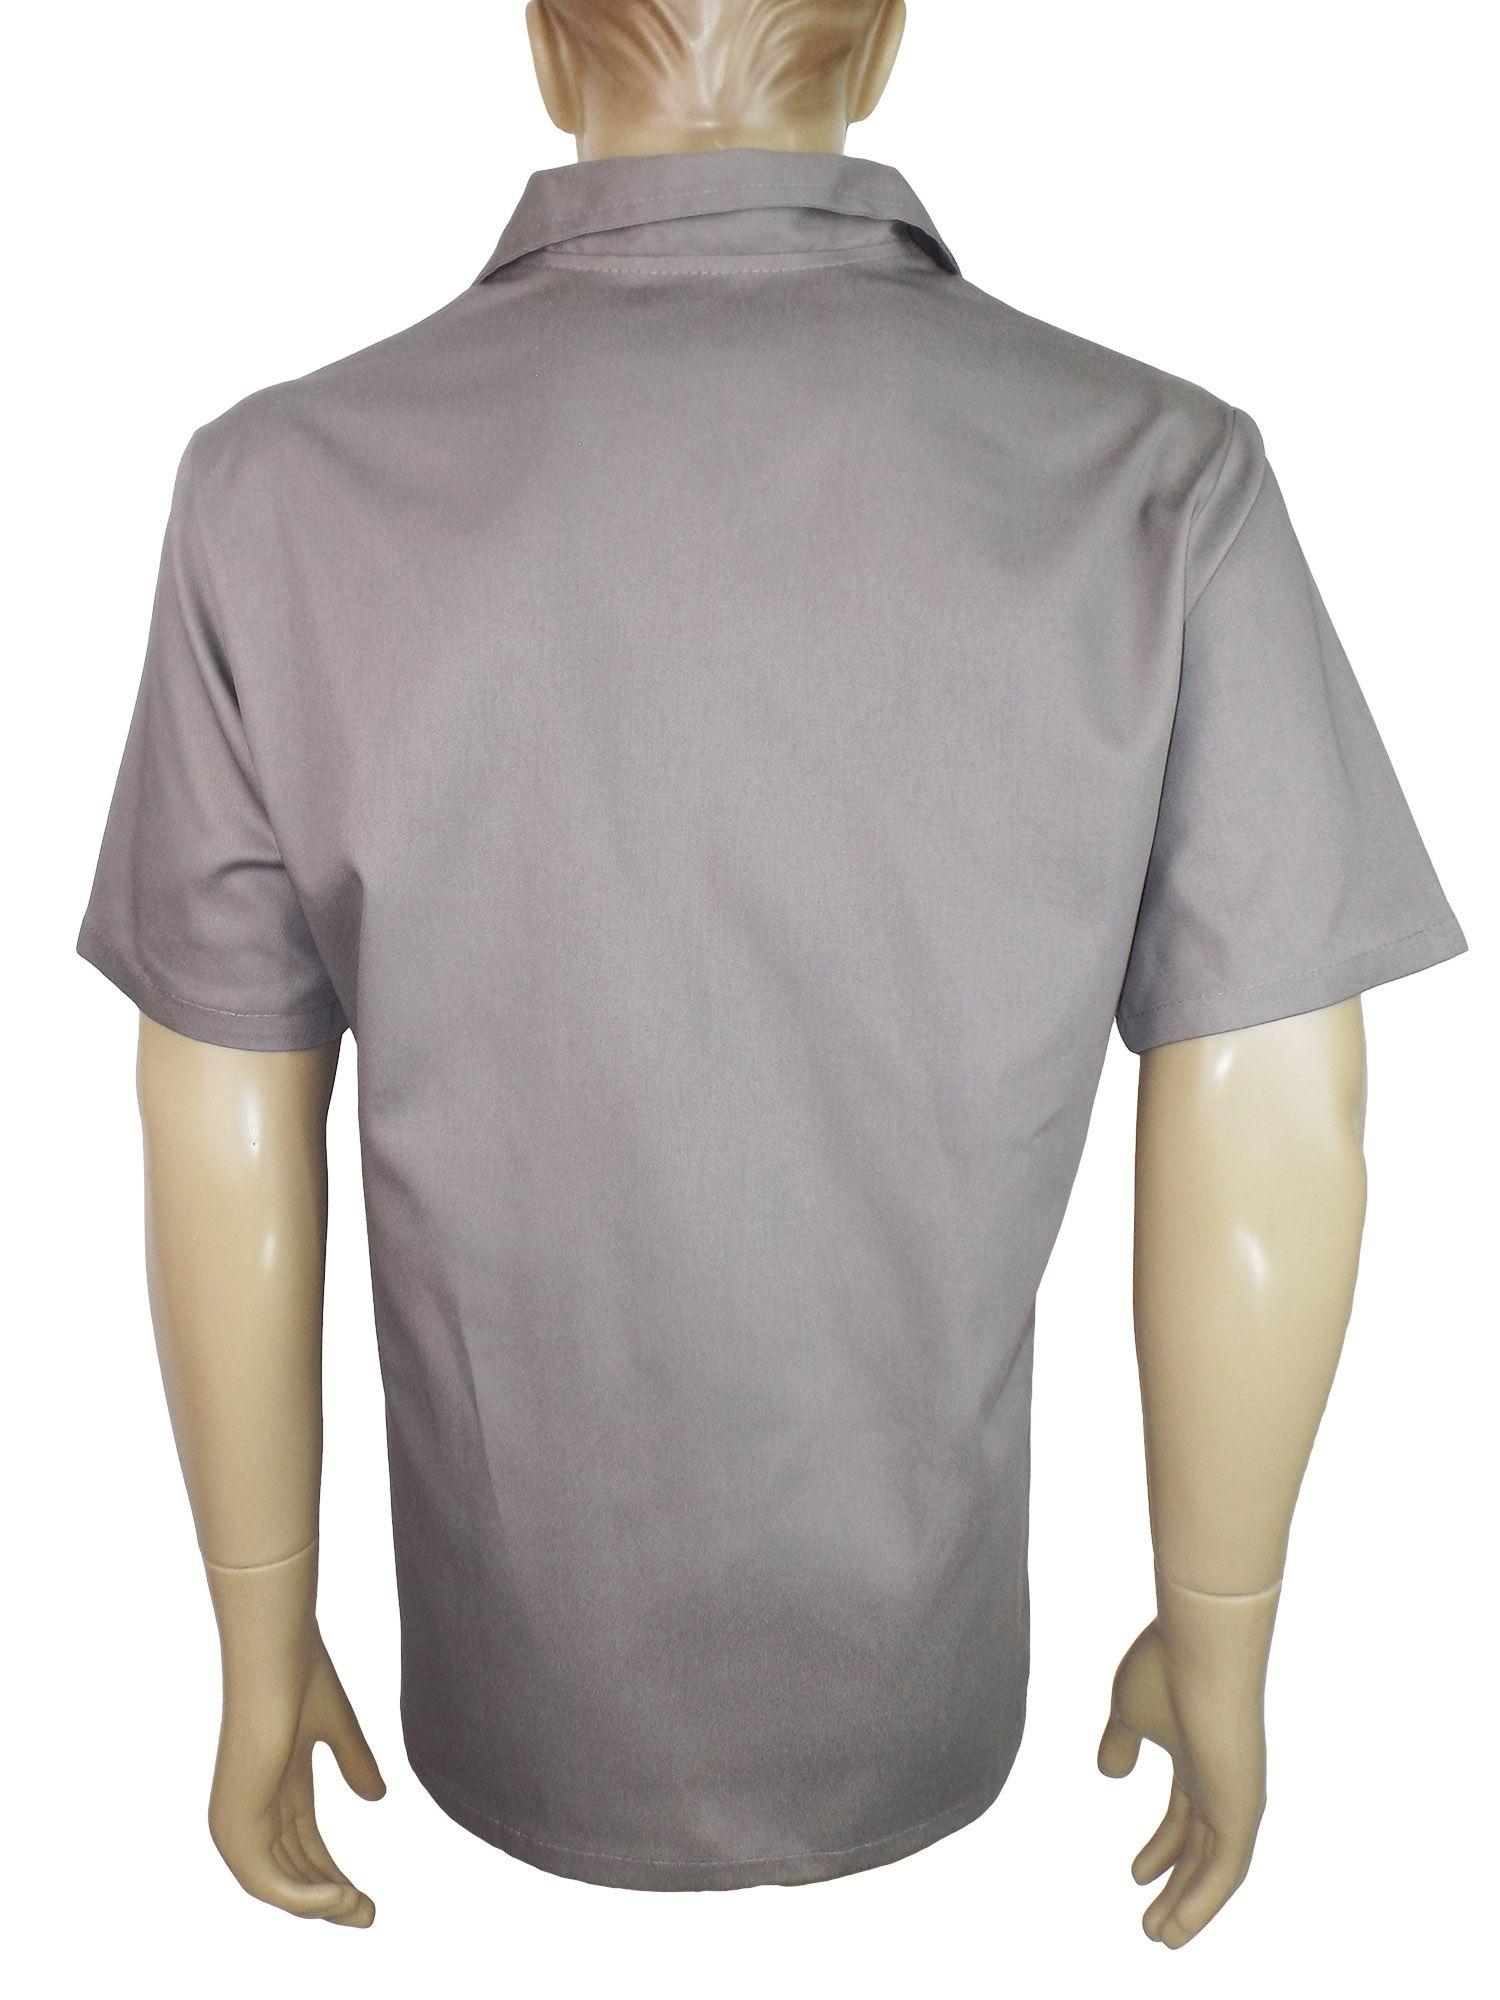 d4050df438f53 Camisa Gola Italiana Manga Curta em Brim Profissional Cinza - Dr EPI ...